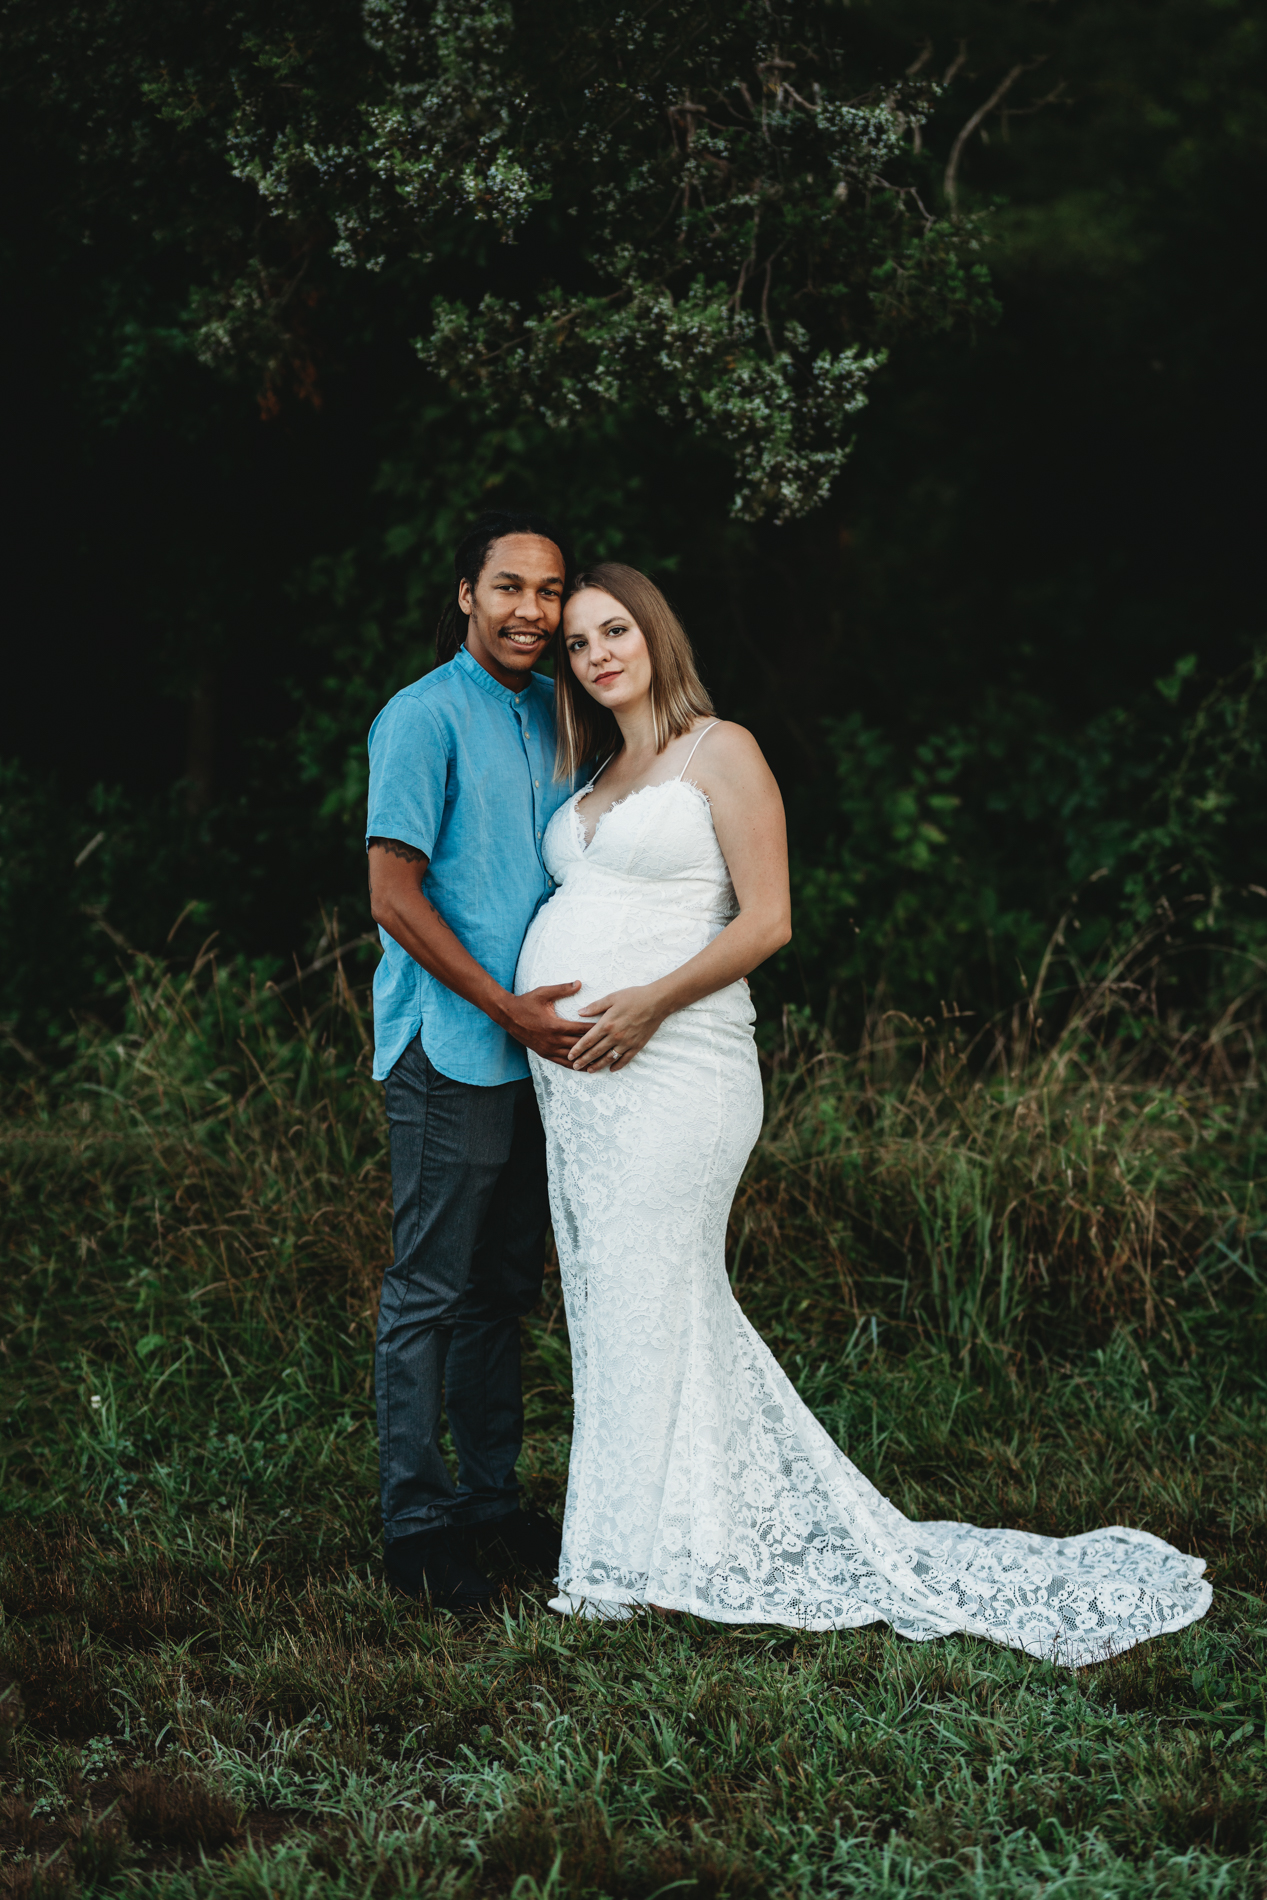 northern virginia glamorous maternity photos pregnancy gown